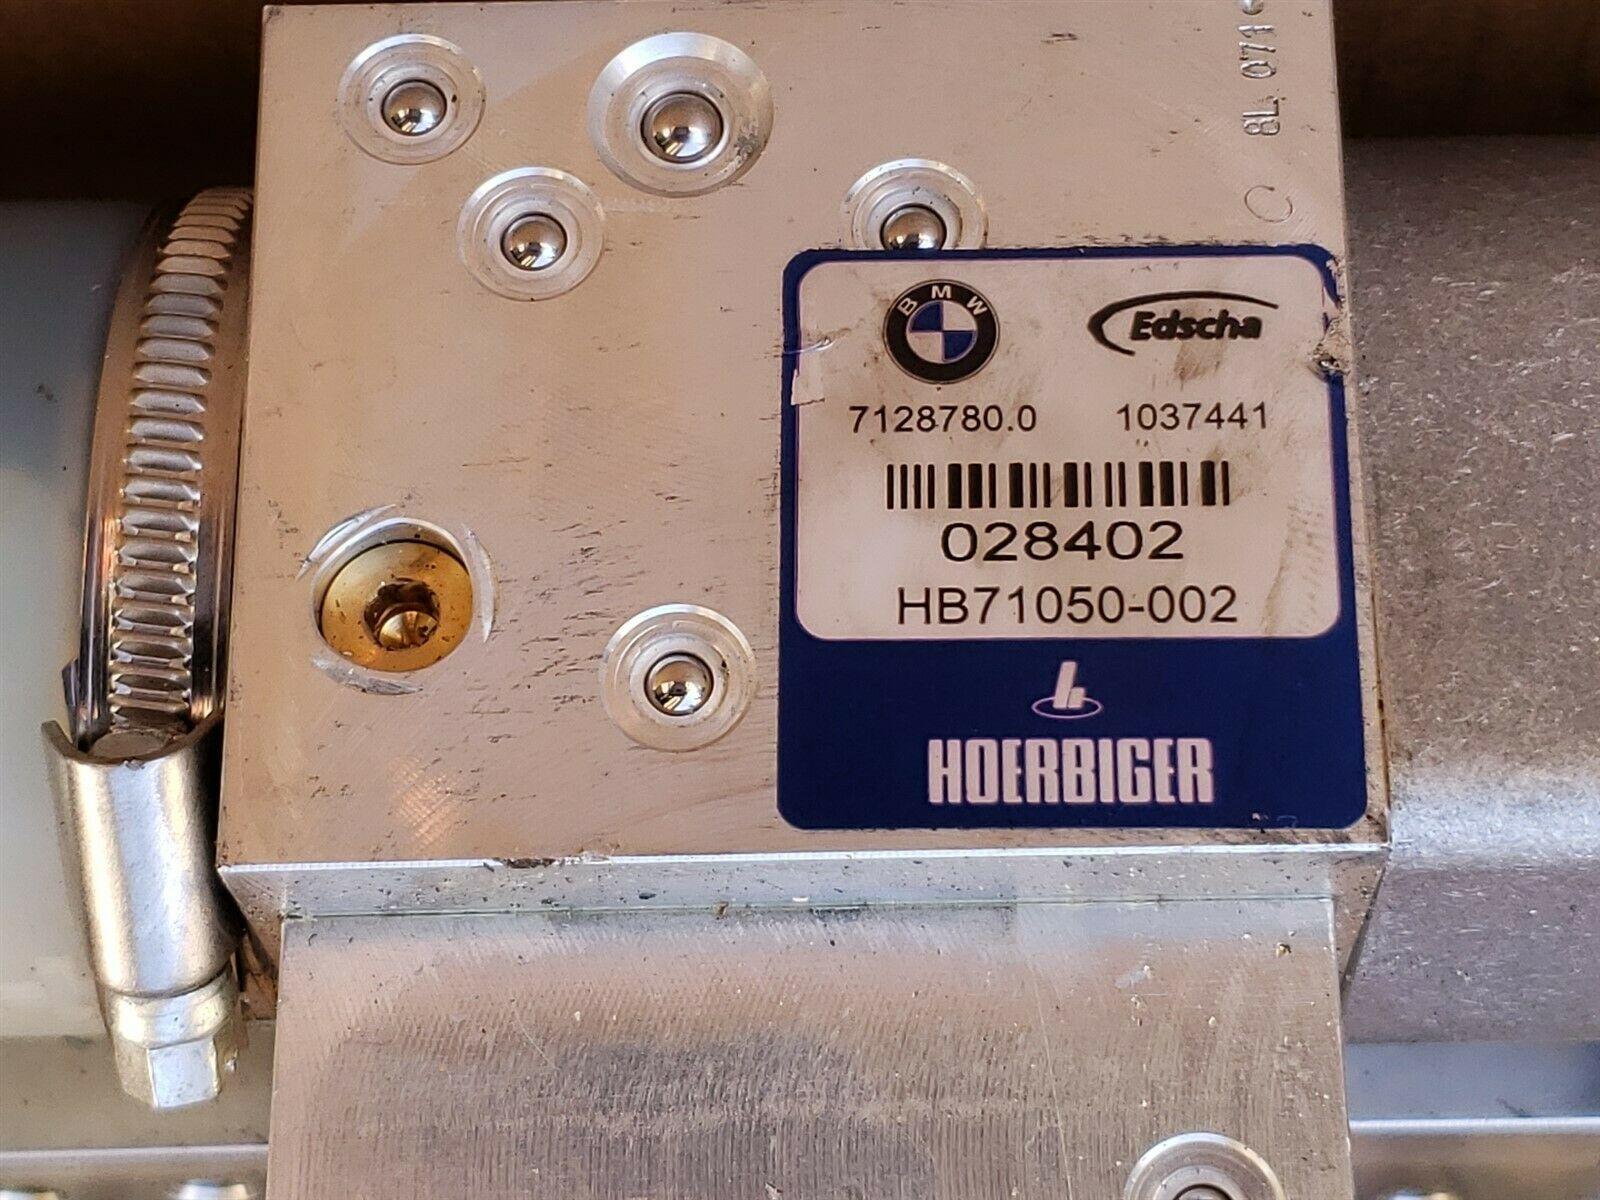 07-13 BMW E93 328i 335i M3 Convertible Hydraulic Roof Top Pump Motor 7128780.0